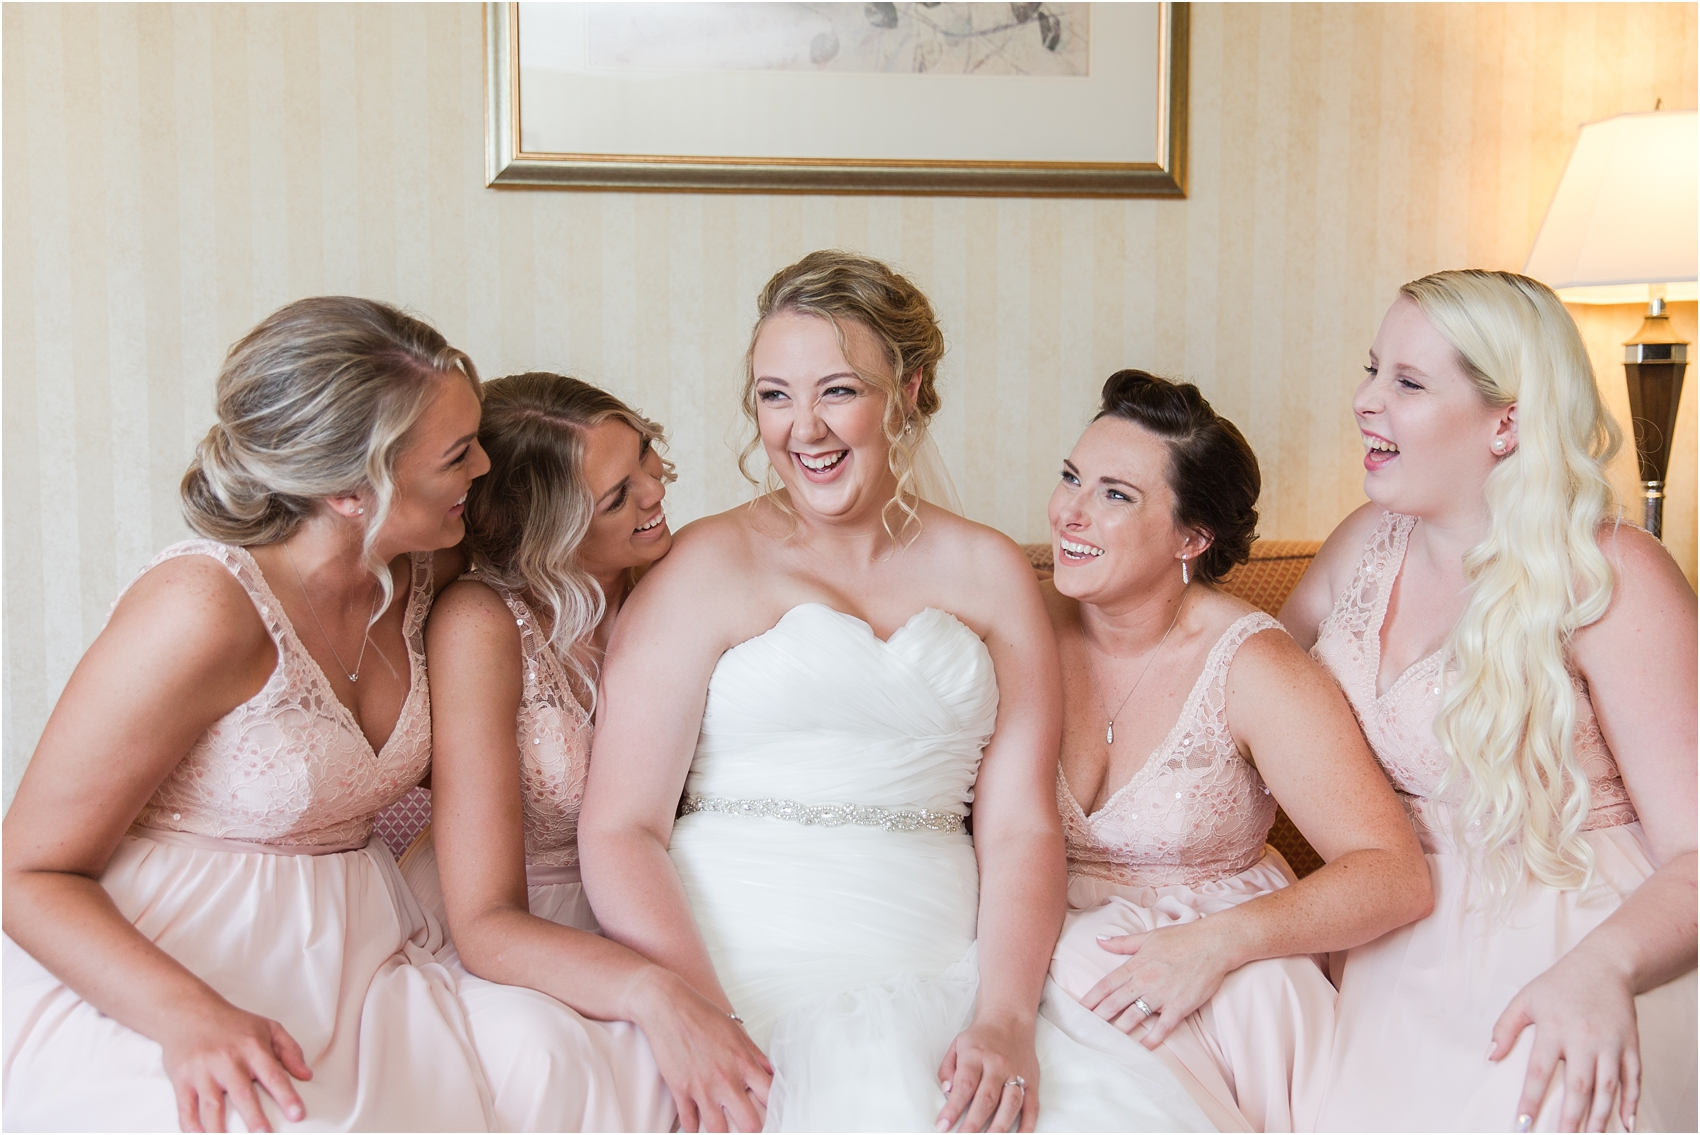 joyful-and-candid-navy-blush-wedding-photos-at-crystal-gardens-in-howell-mi-by-courtney-carolyn-photography_0026.jpg